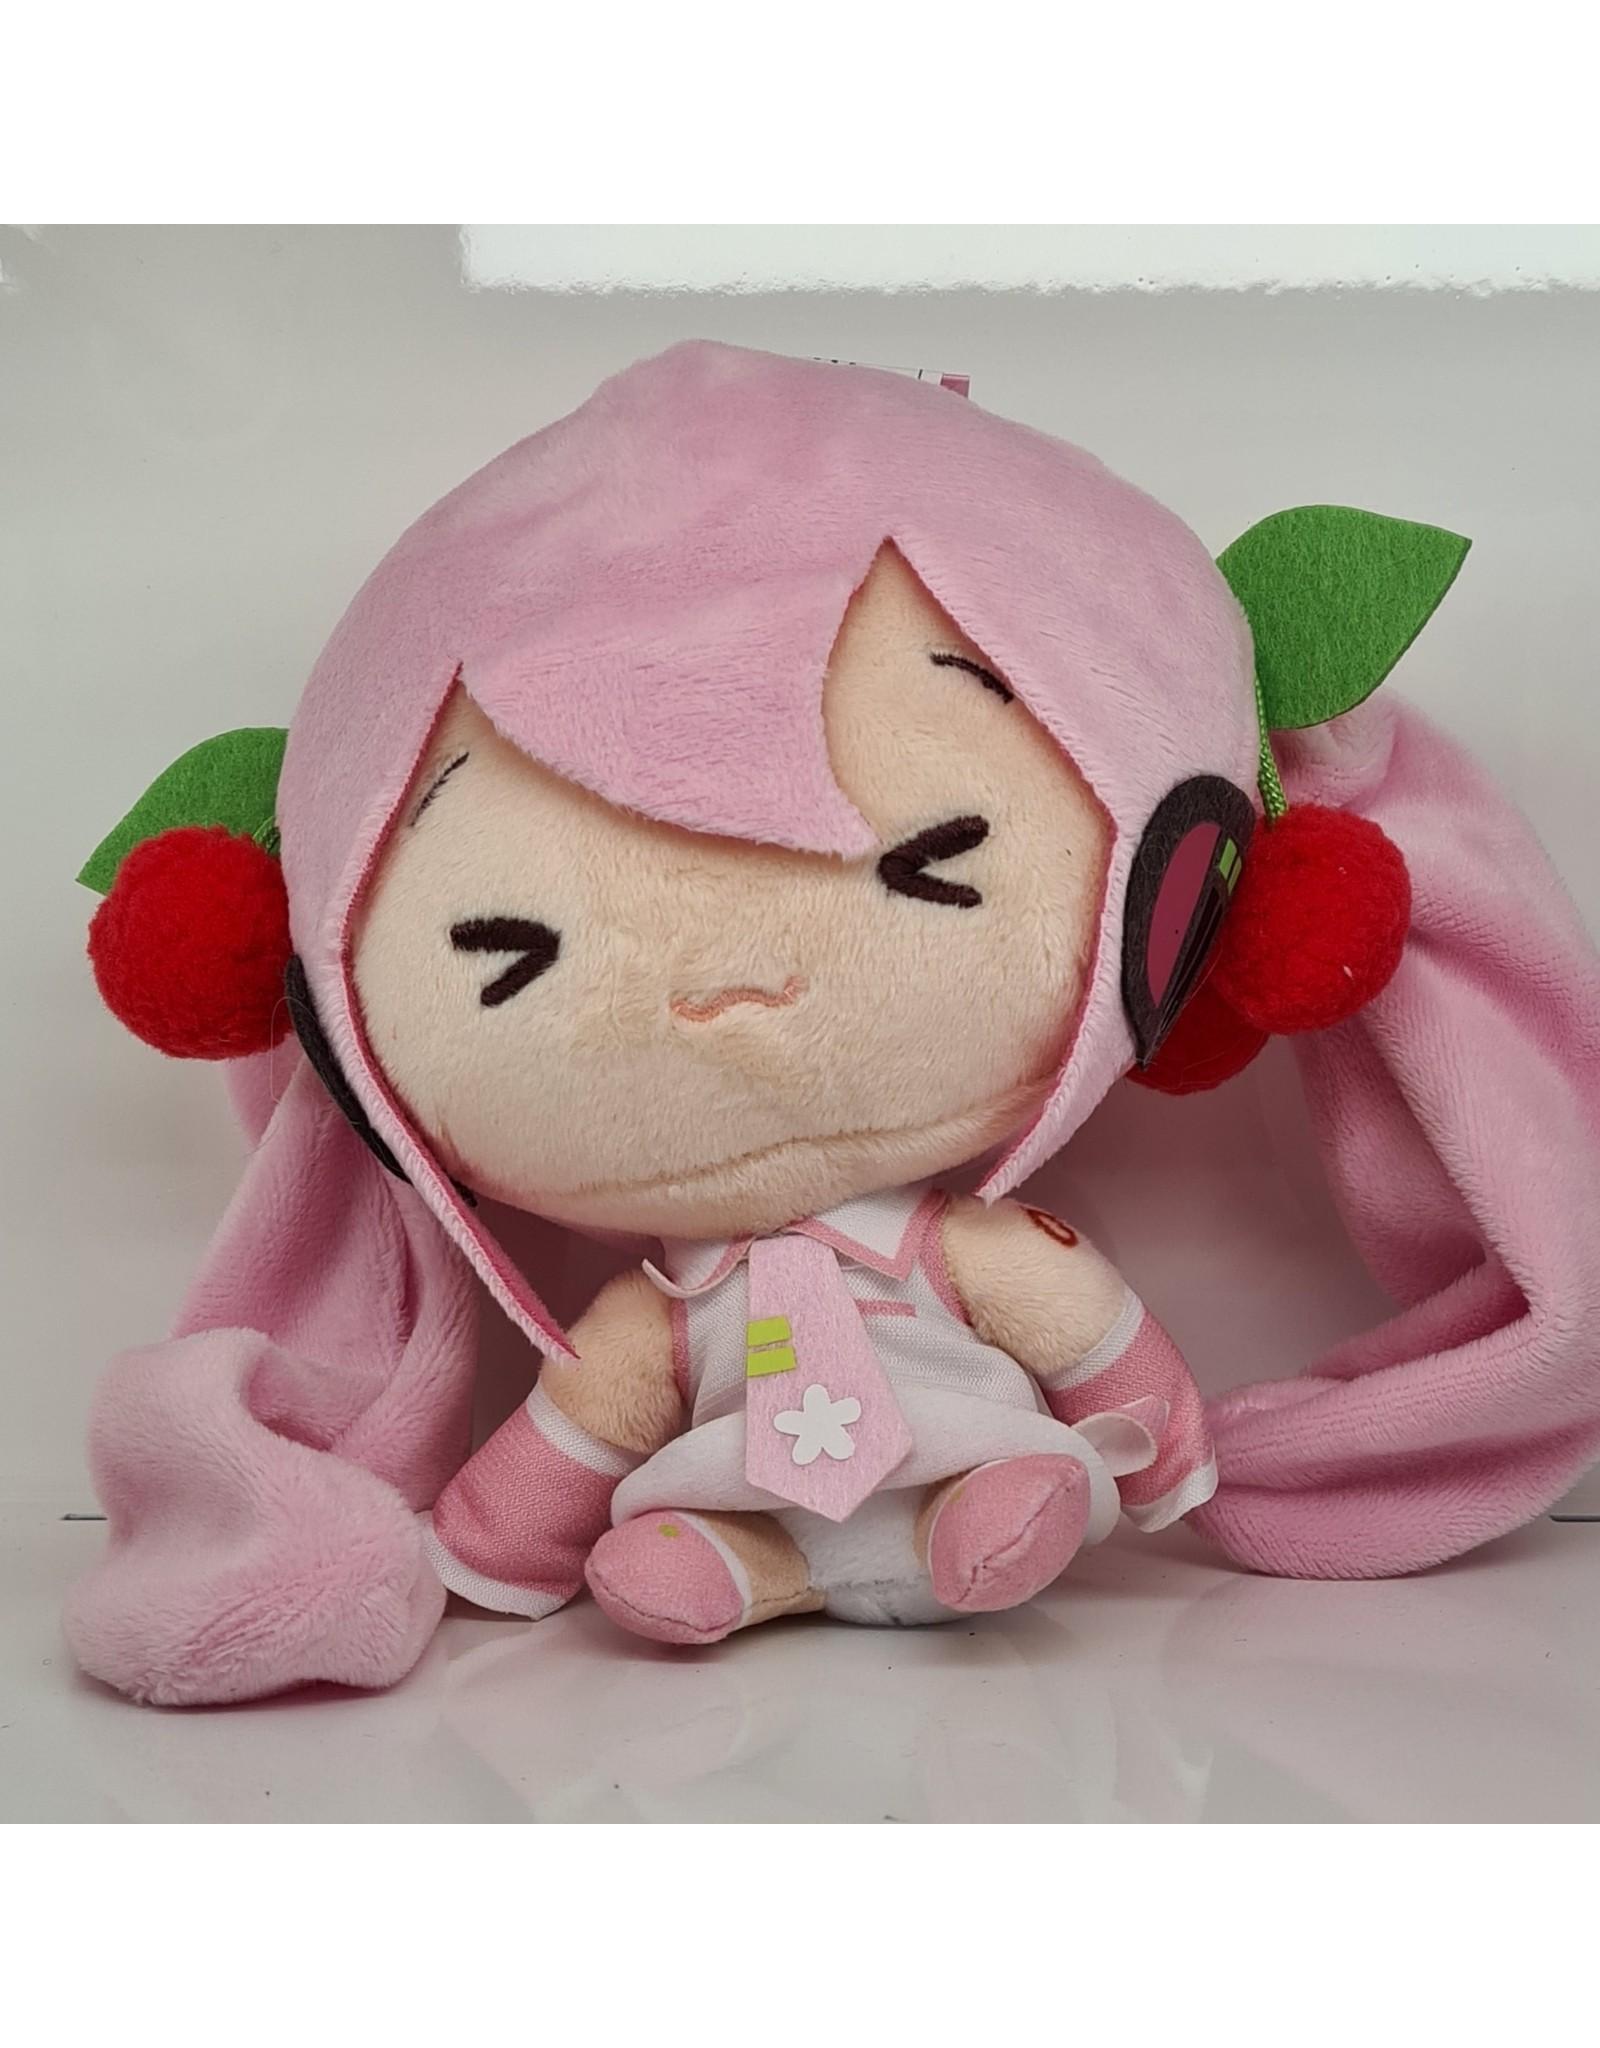 Hatsune Miku Cute Plush Sakura Miku Version - Eyes Closed - 14 cm